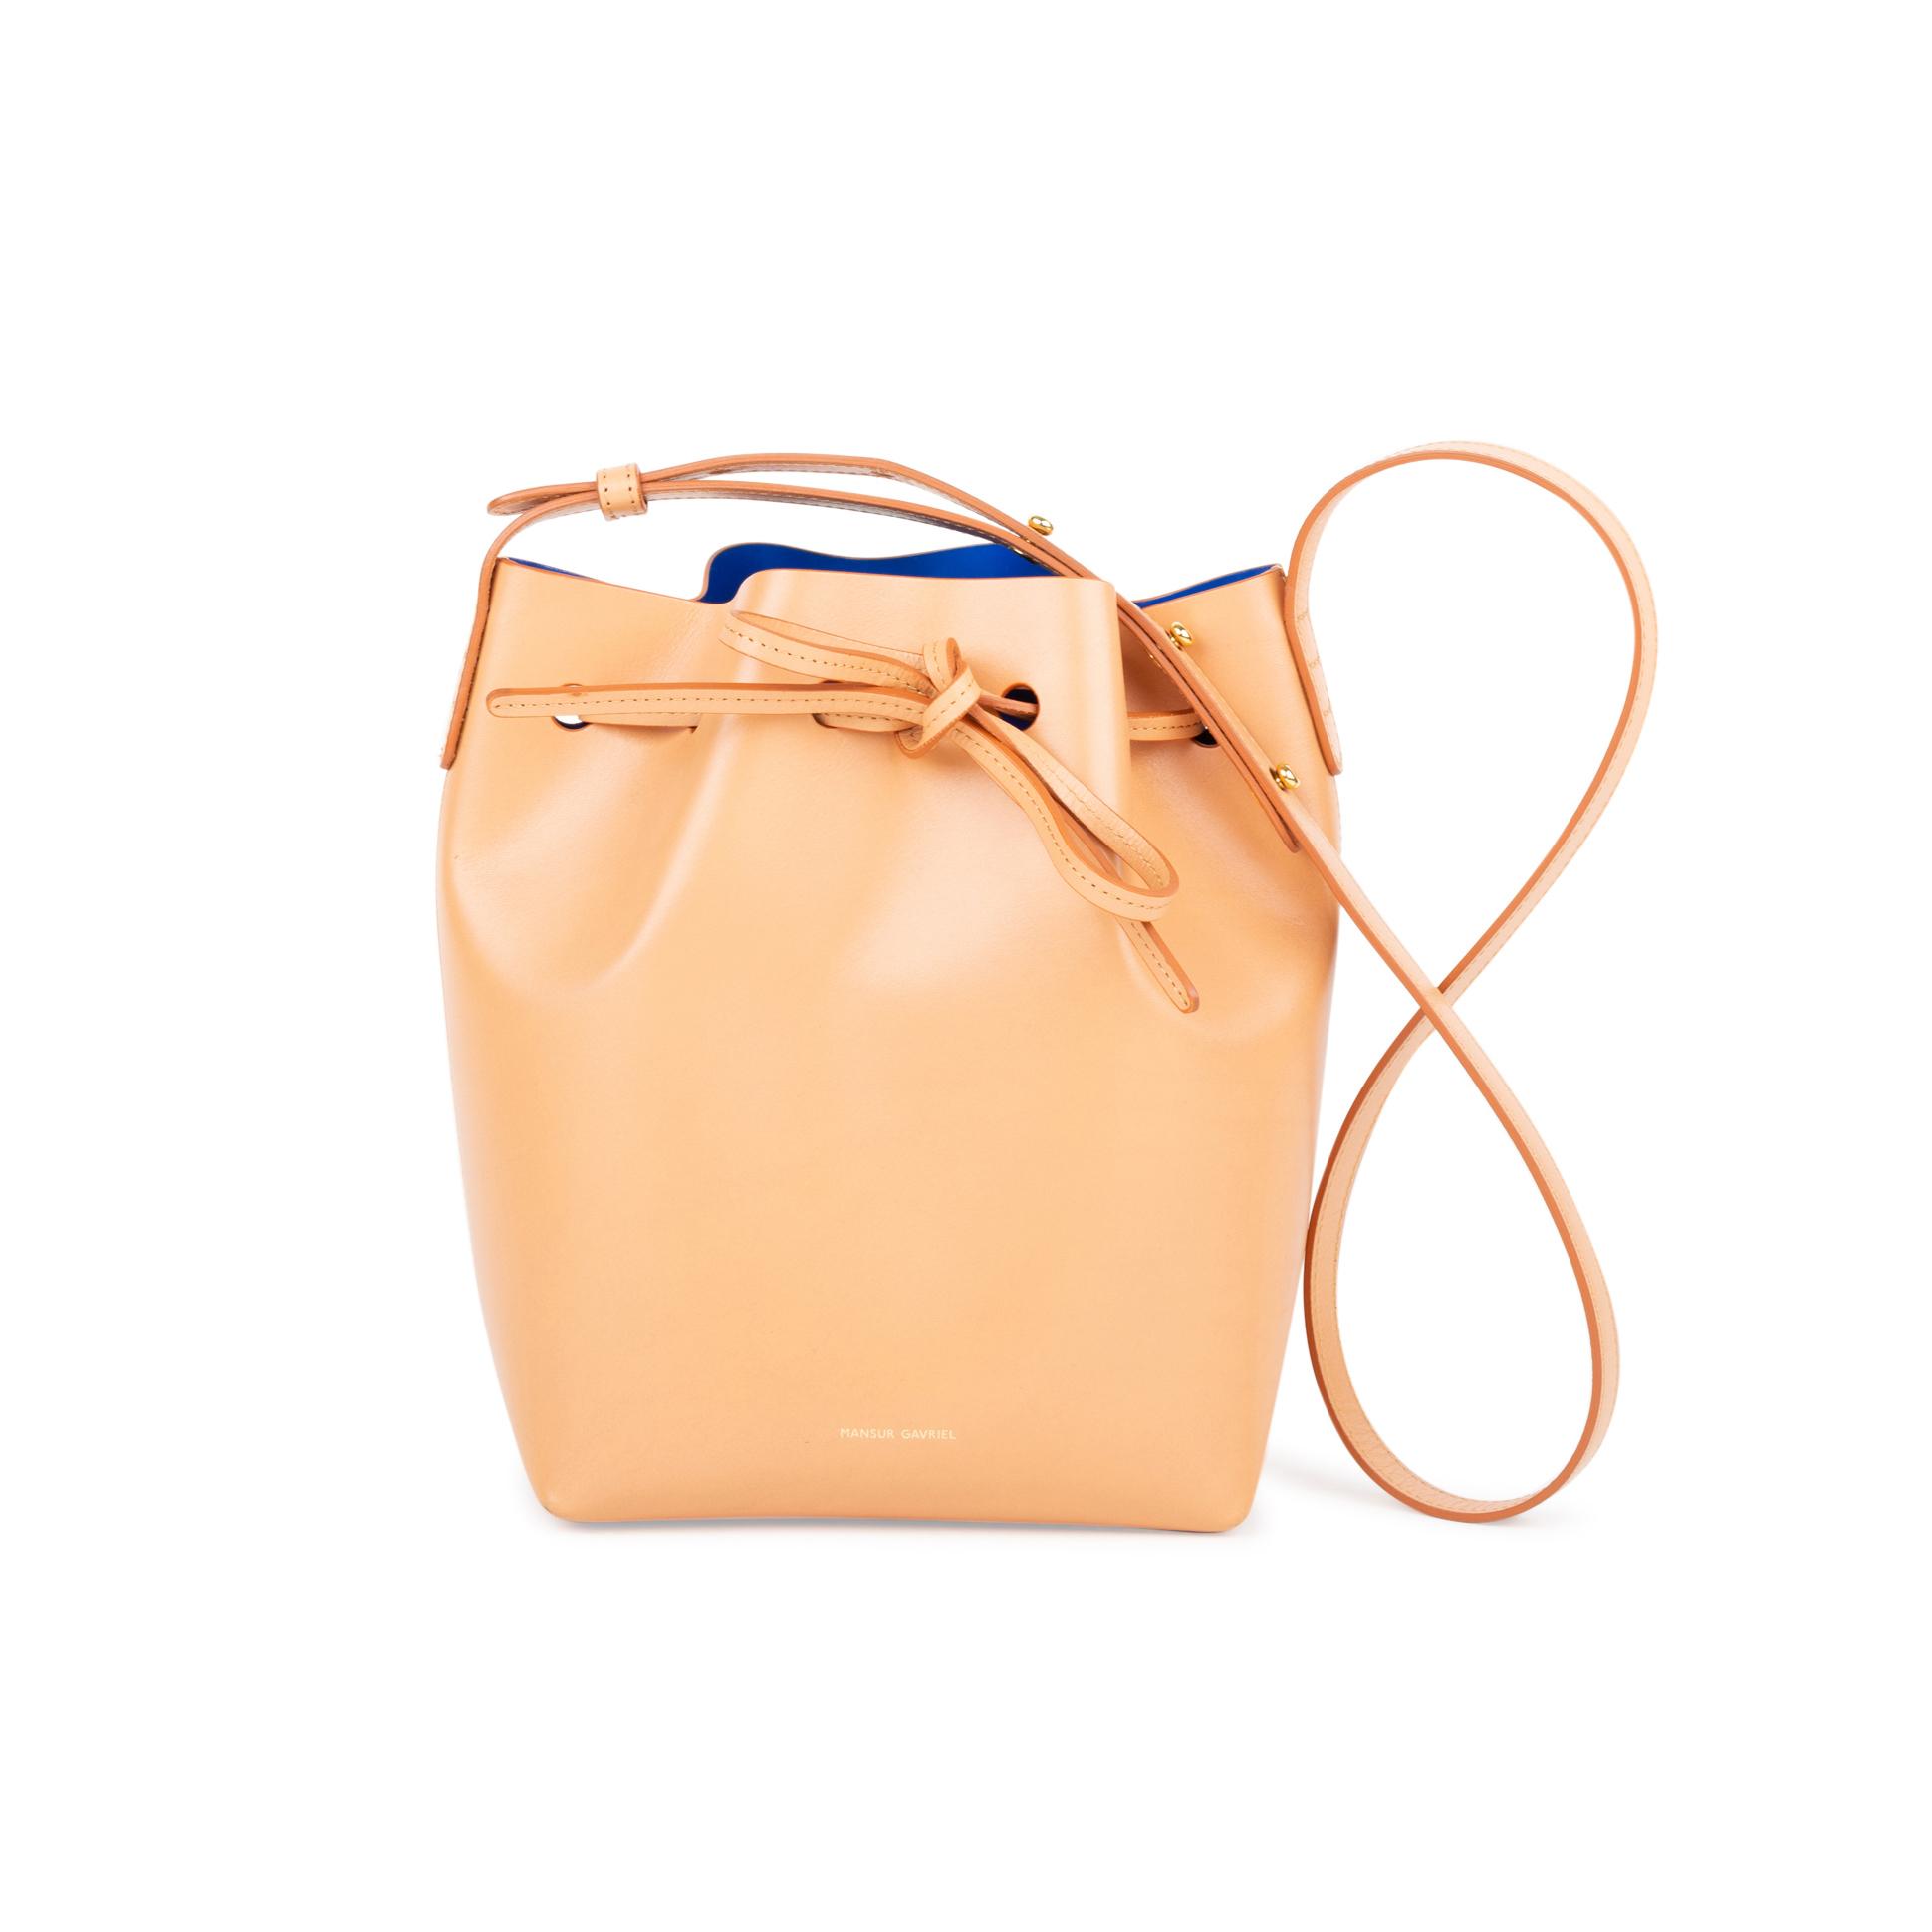 f954db8103e0 Authentic Second Hand Mansur Gavriel Cammelo Mini Bucket Bag  (PSS-558-00002)